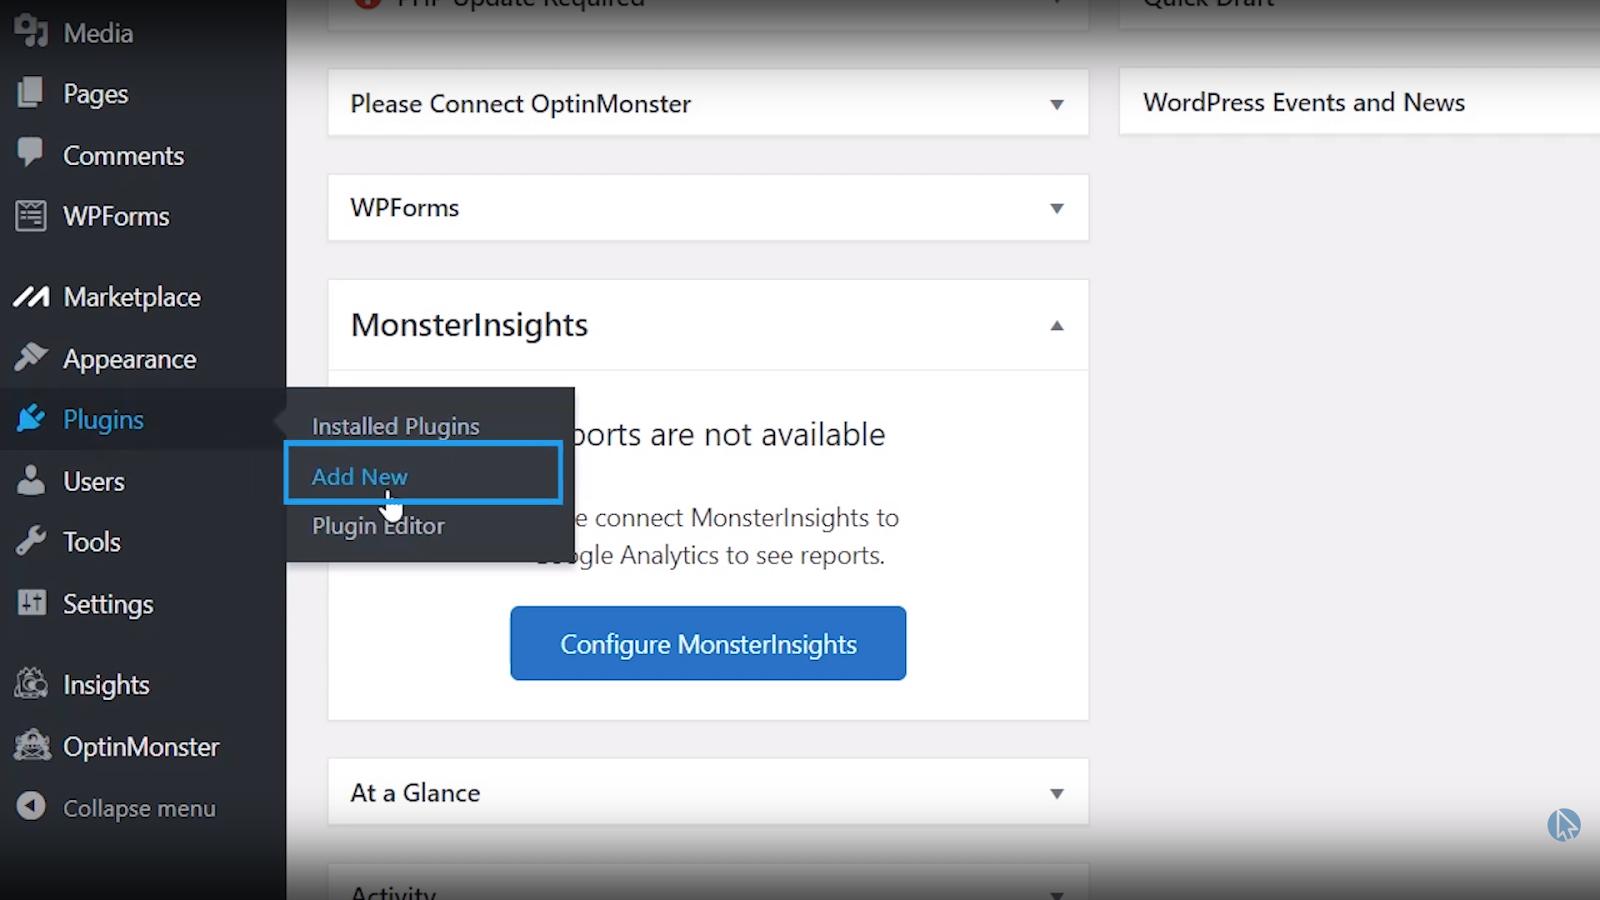 add new plugins wordpress tutorial for beginners